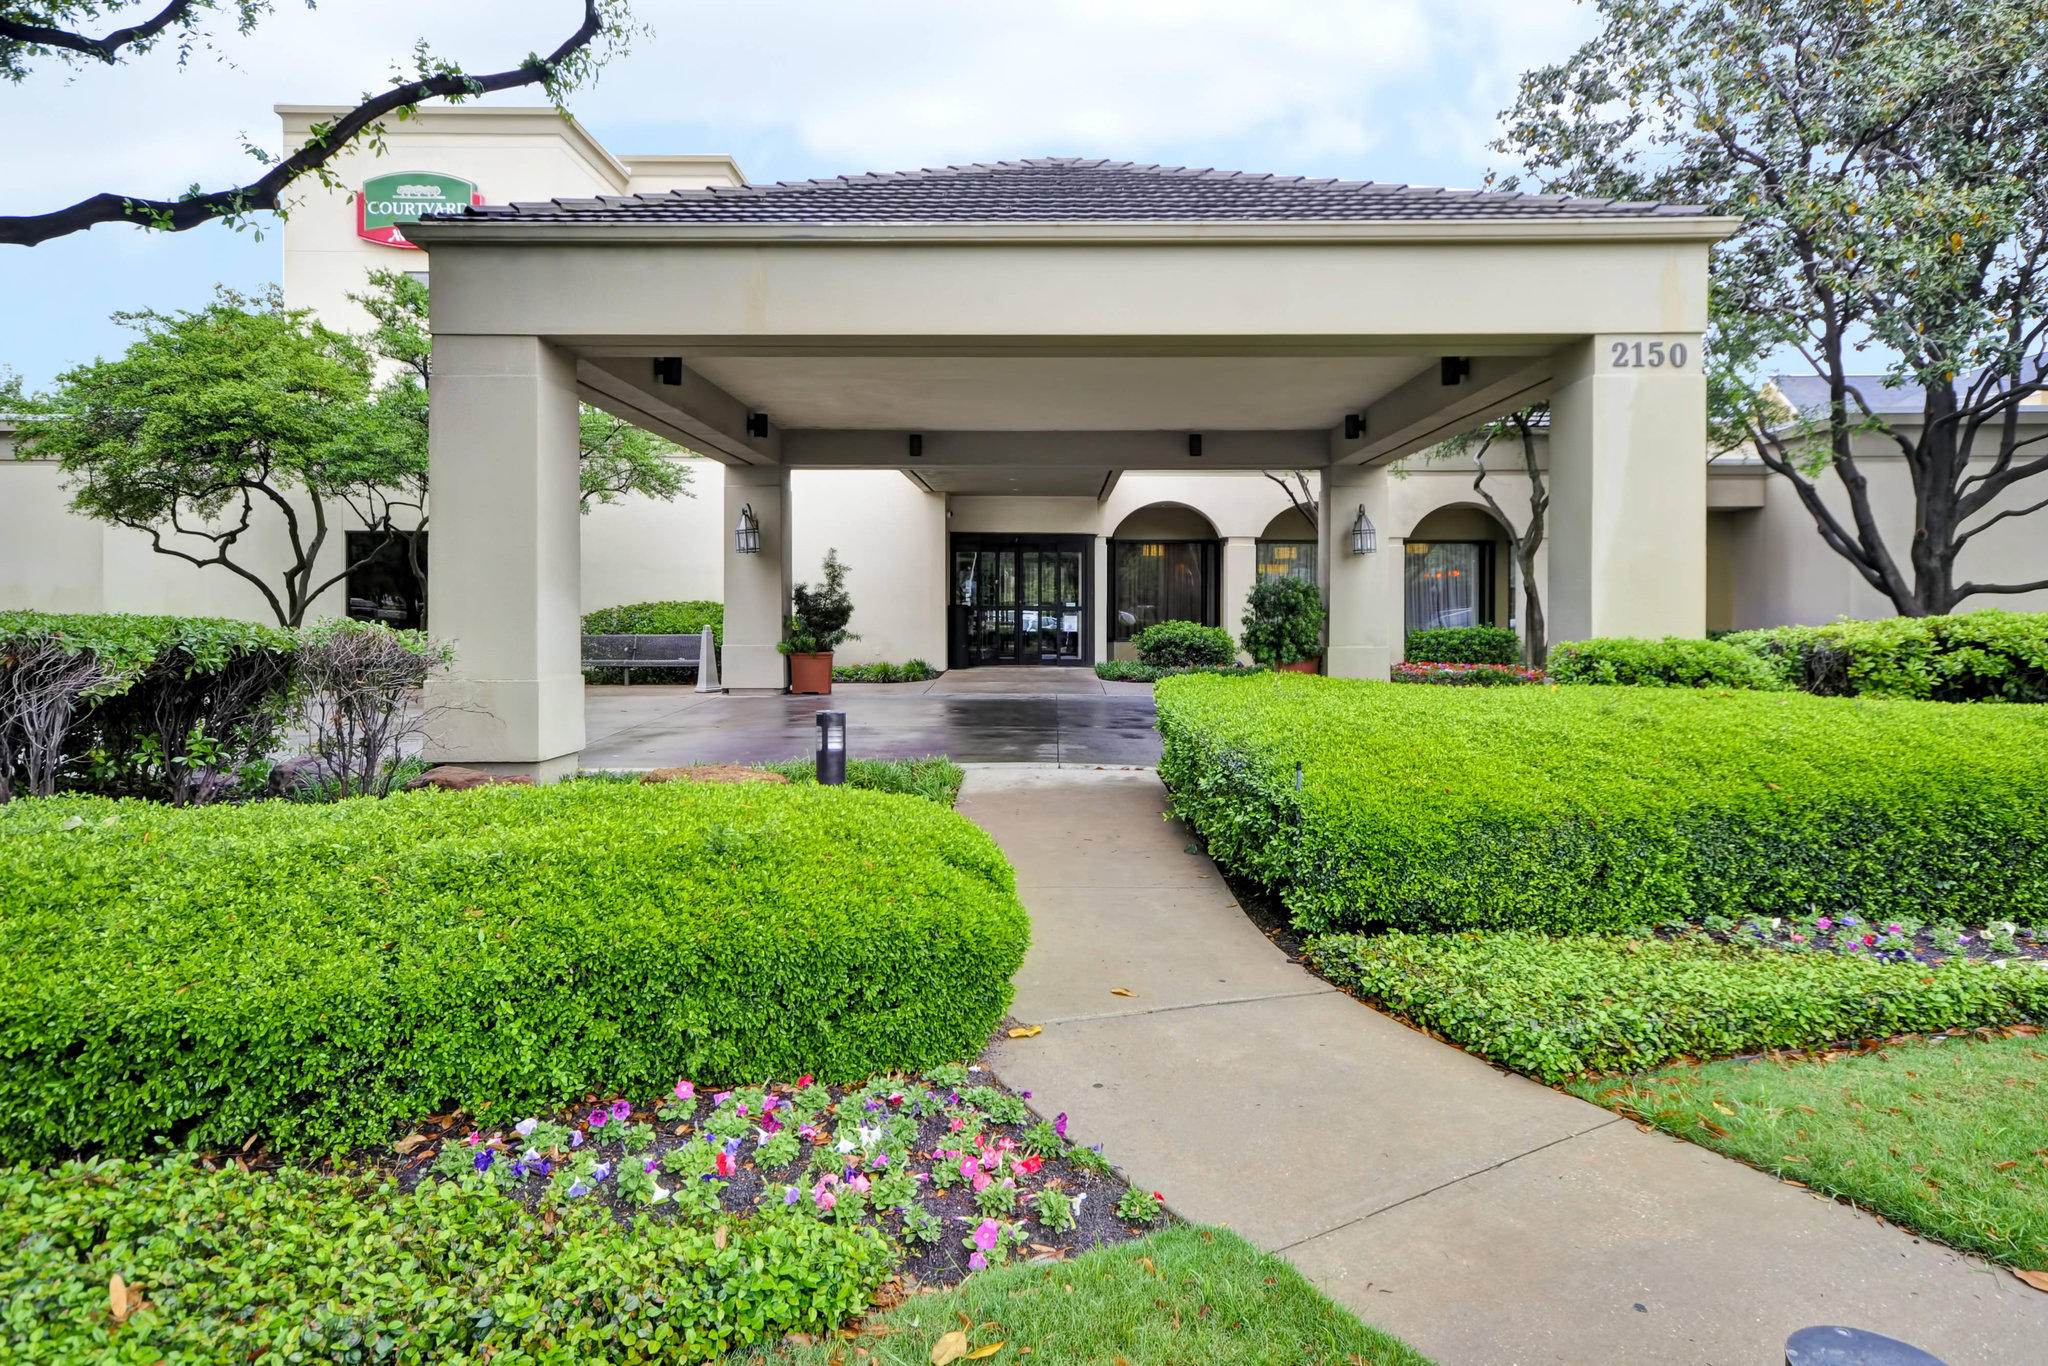 Courtyard by Marriott Dallas Medical/Market Center